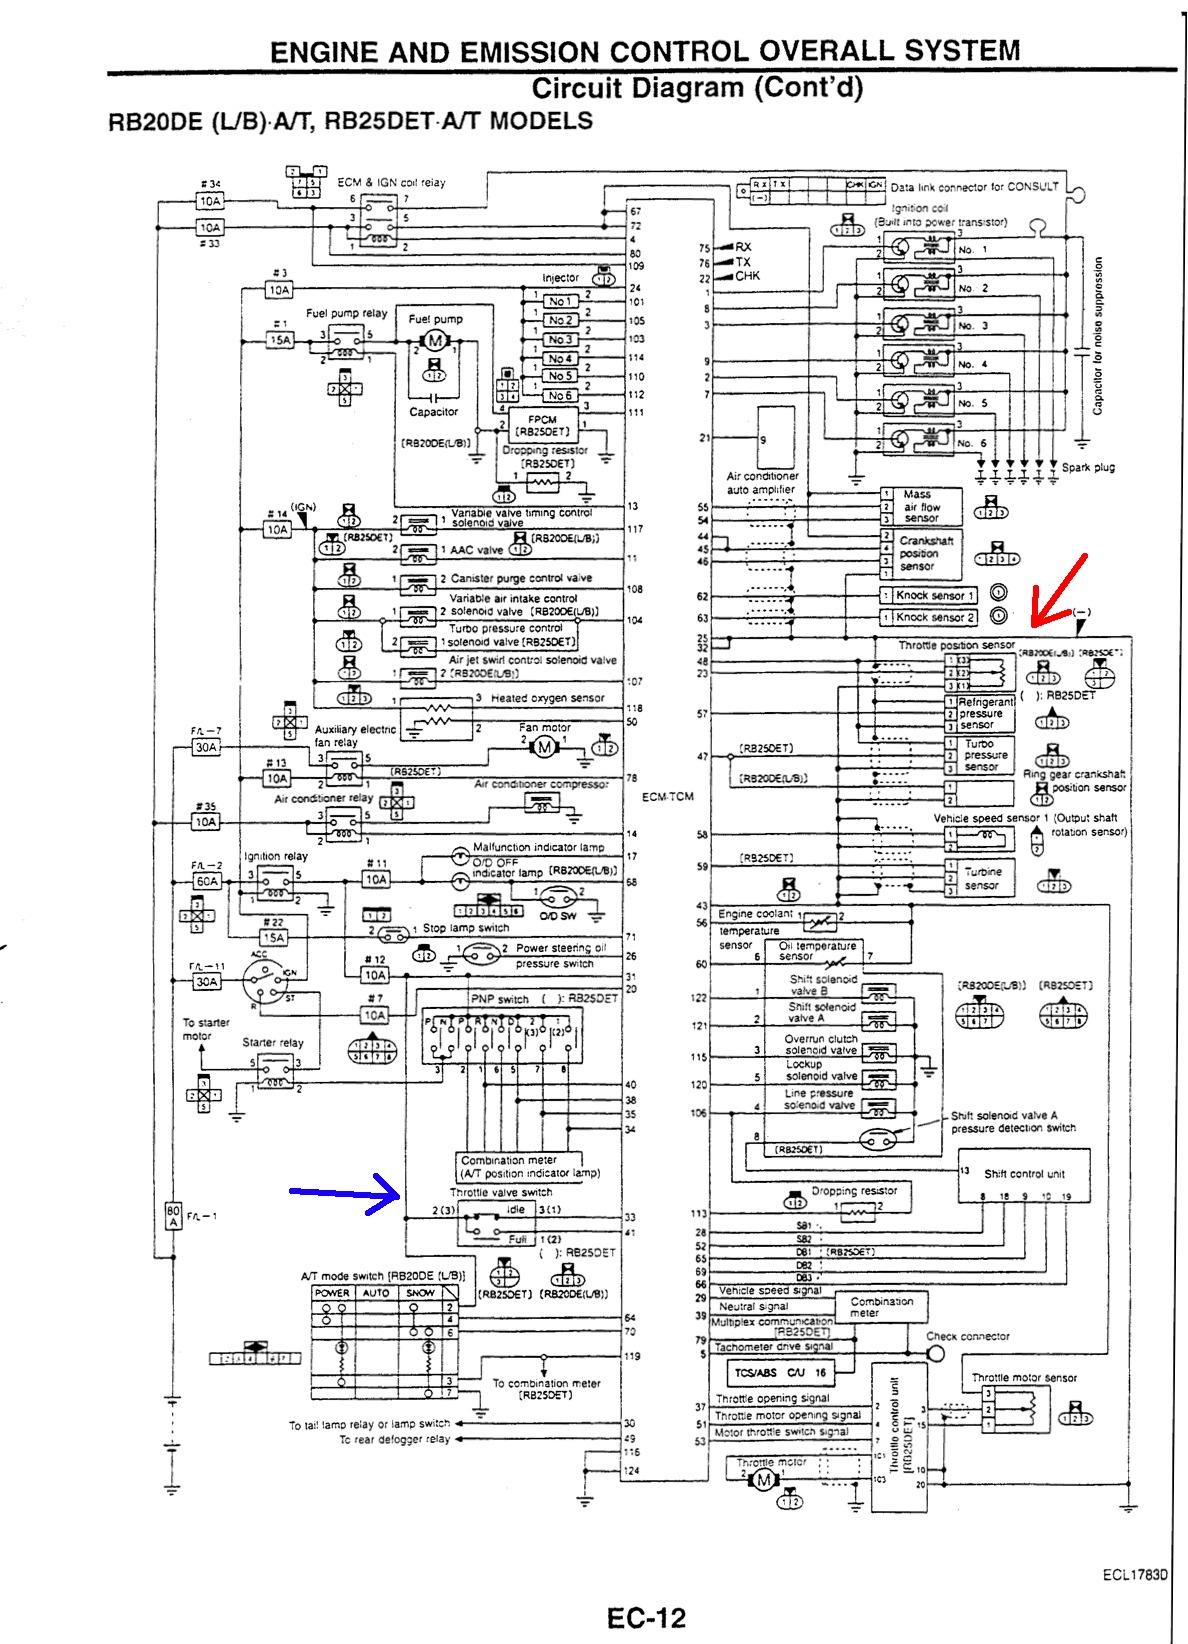 rb20det ecu wiring diagram lutron nissan skyline gtst r33 pinout printable